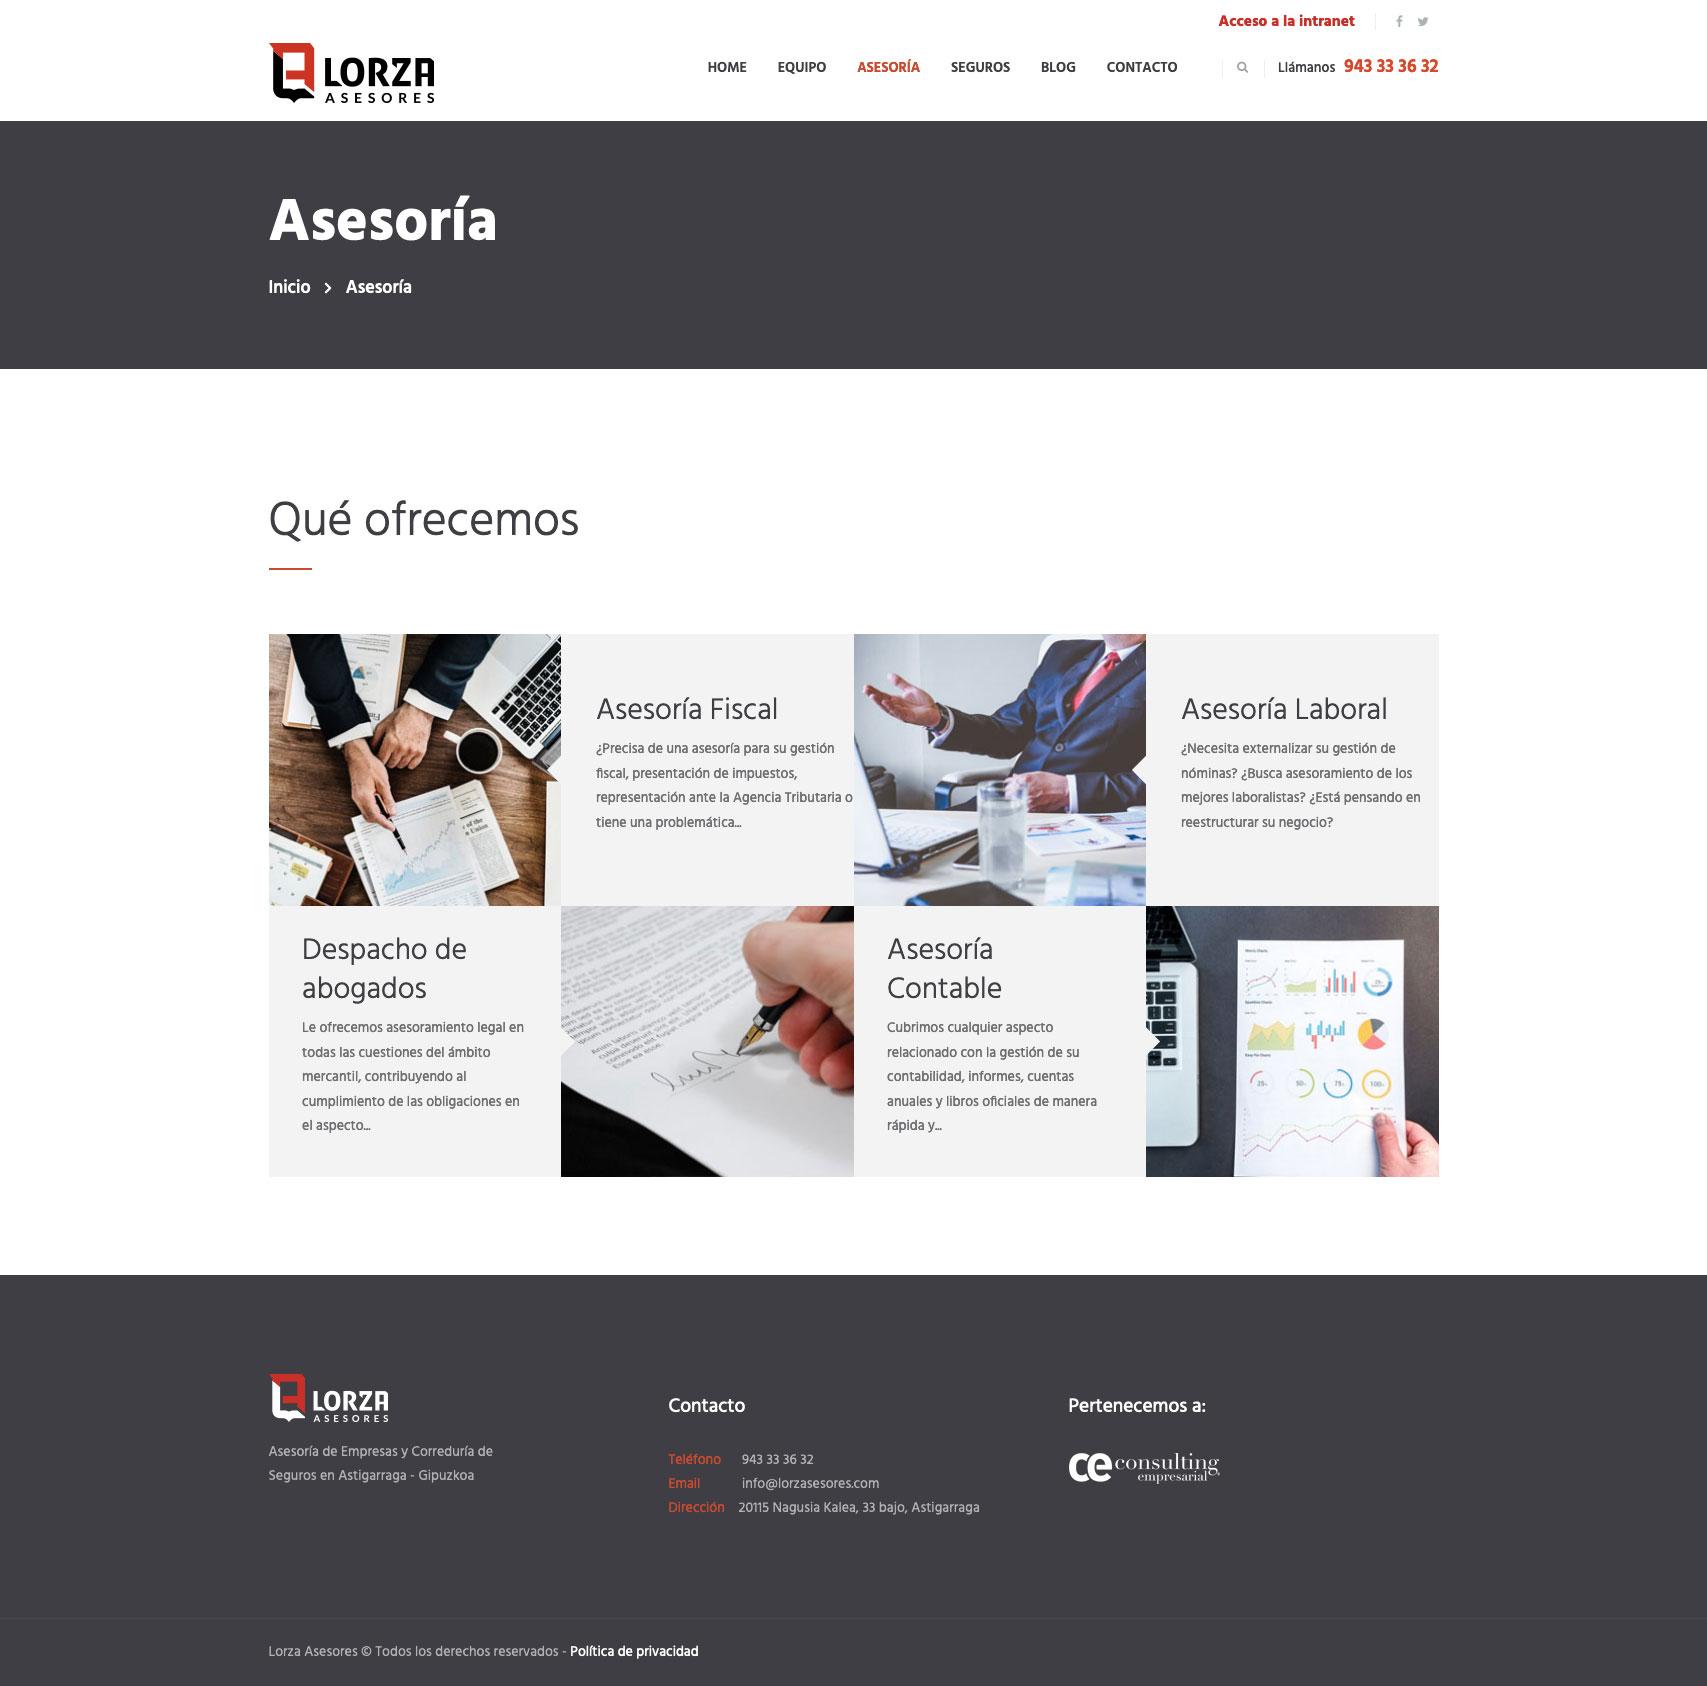 Lorza Asesores - Diseño Web 4